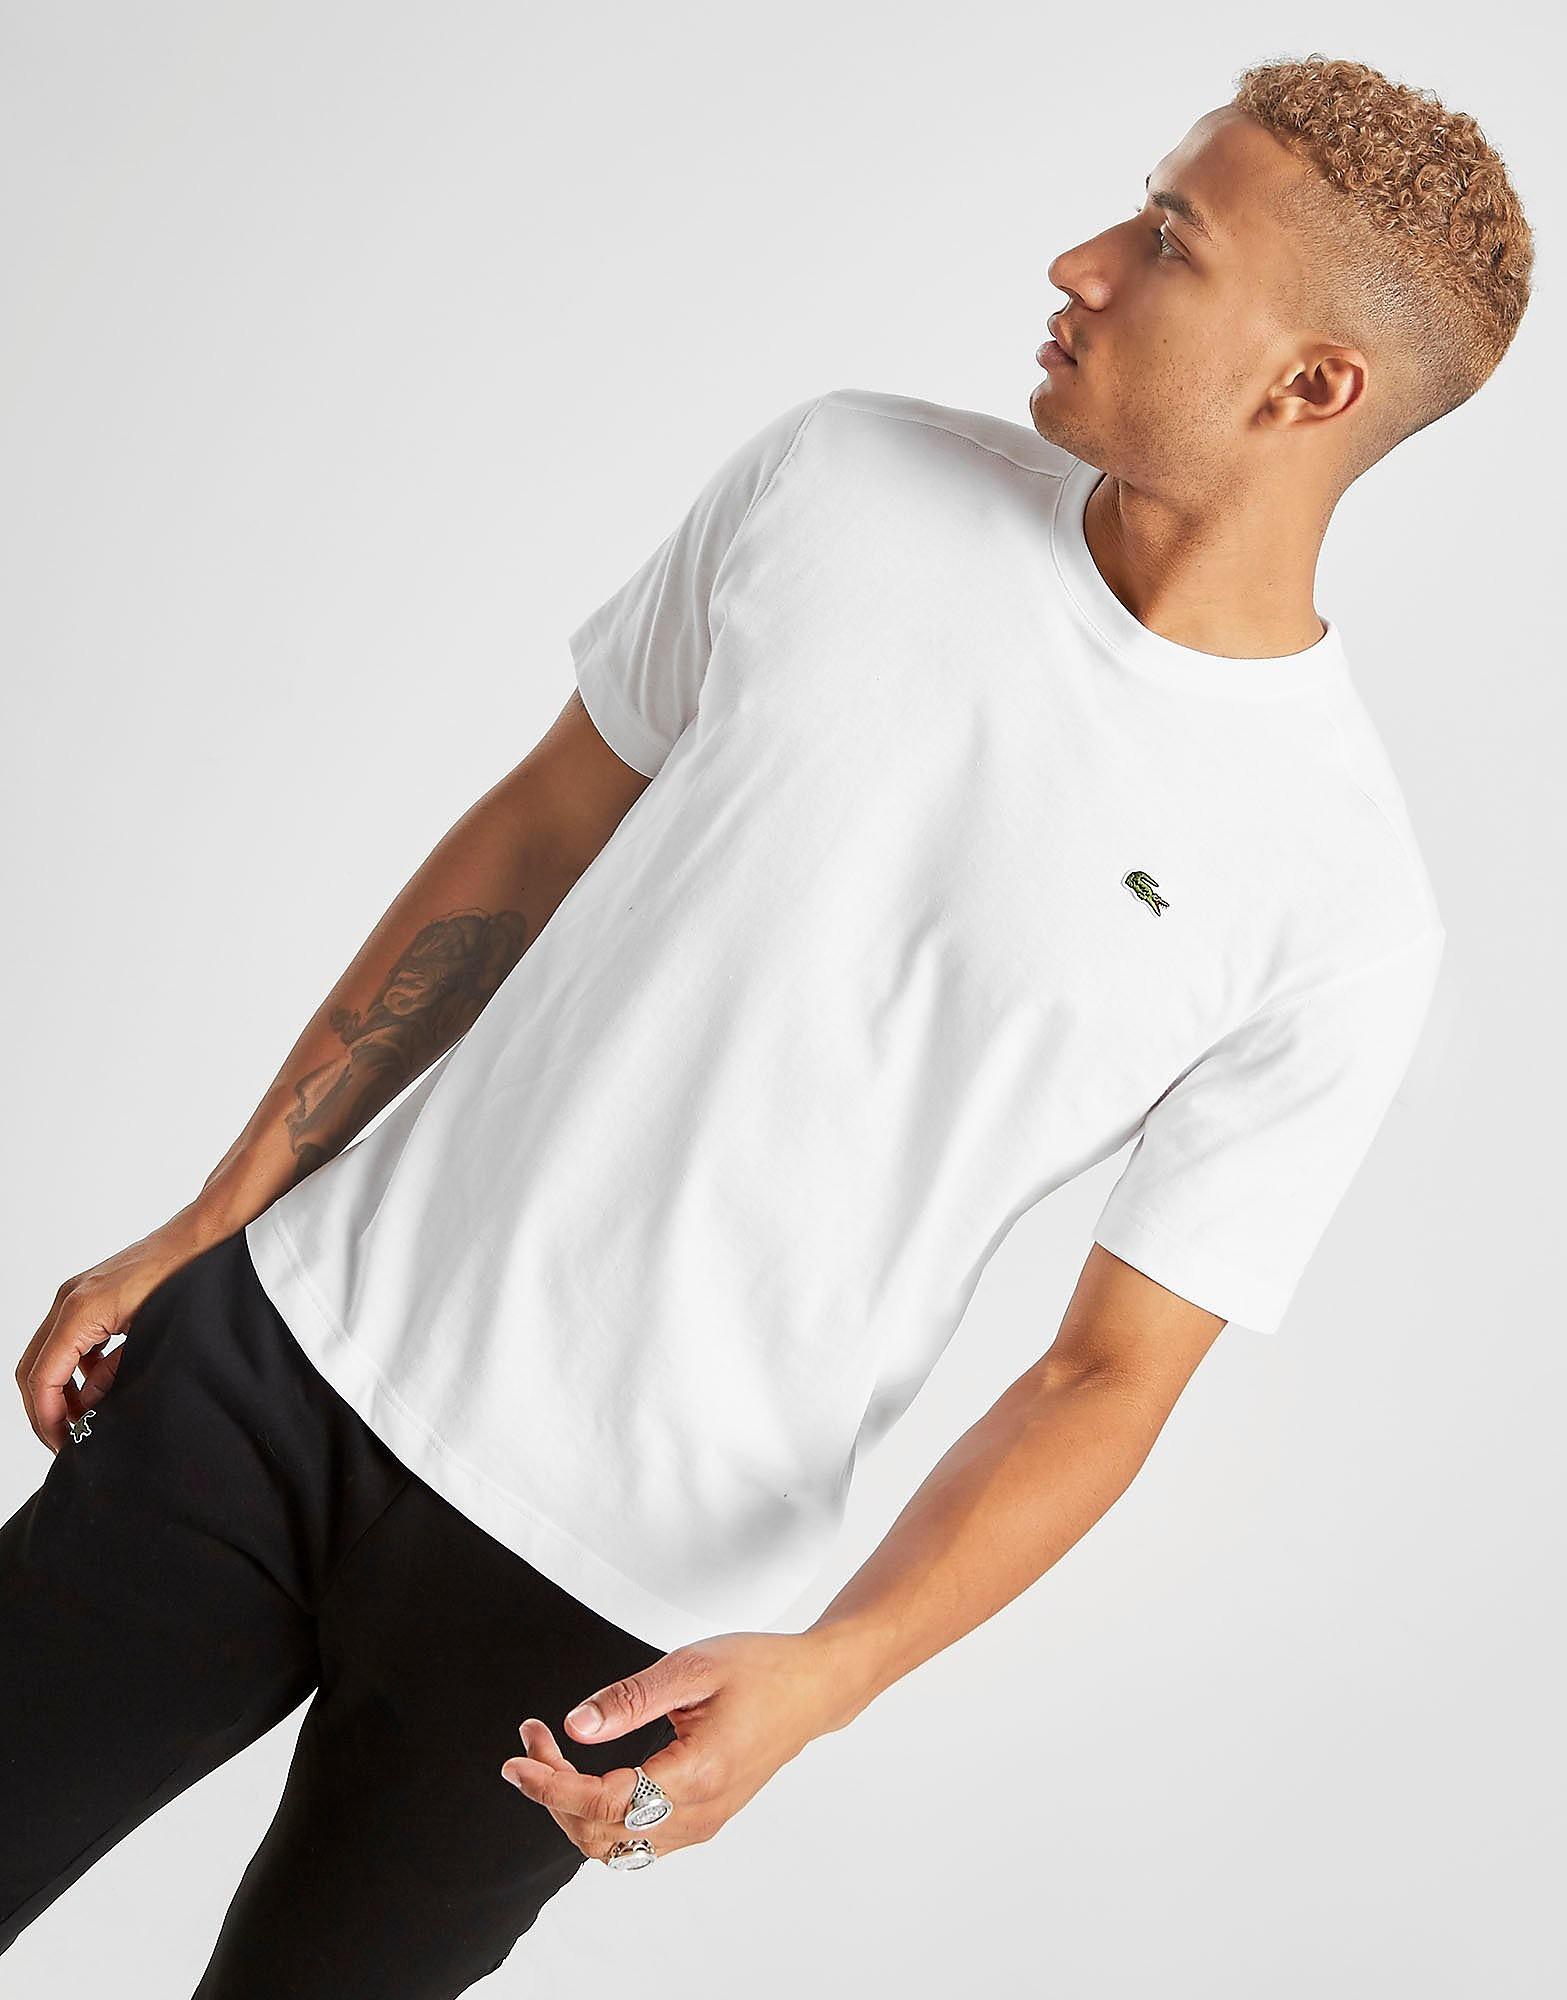 Lacoste Croc Short Sleeve T-Shirt Herre